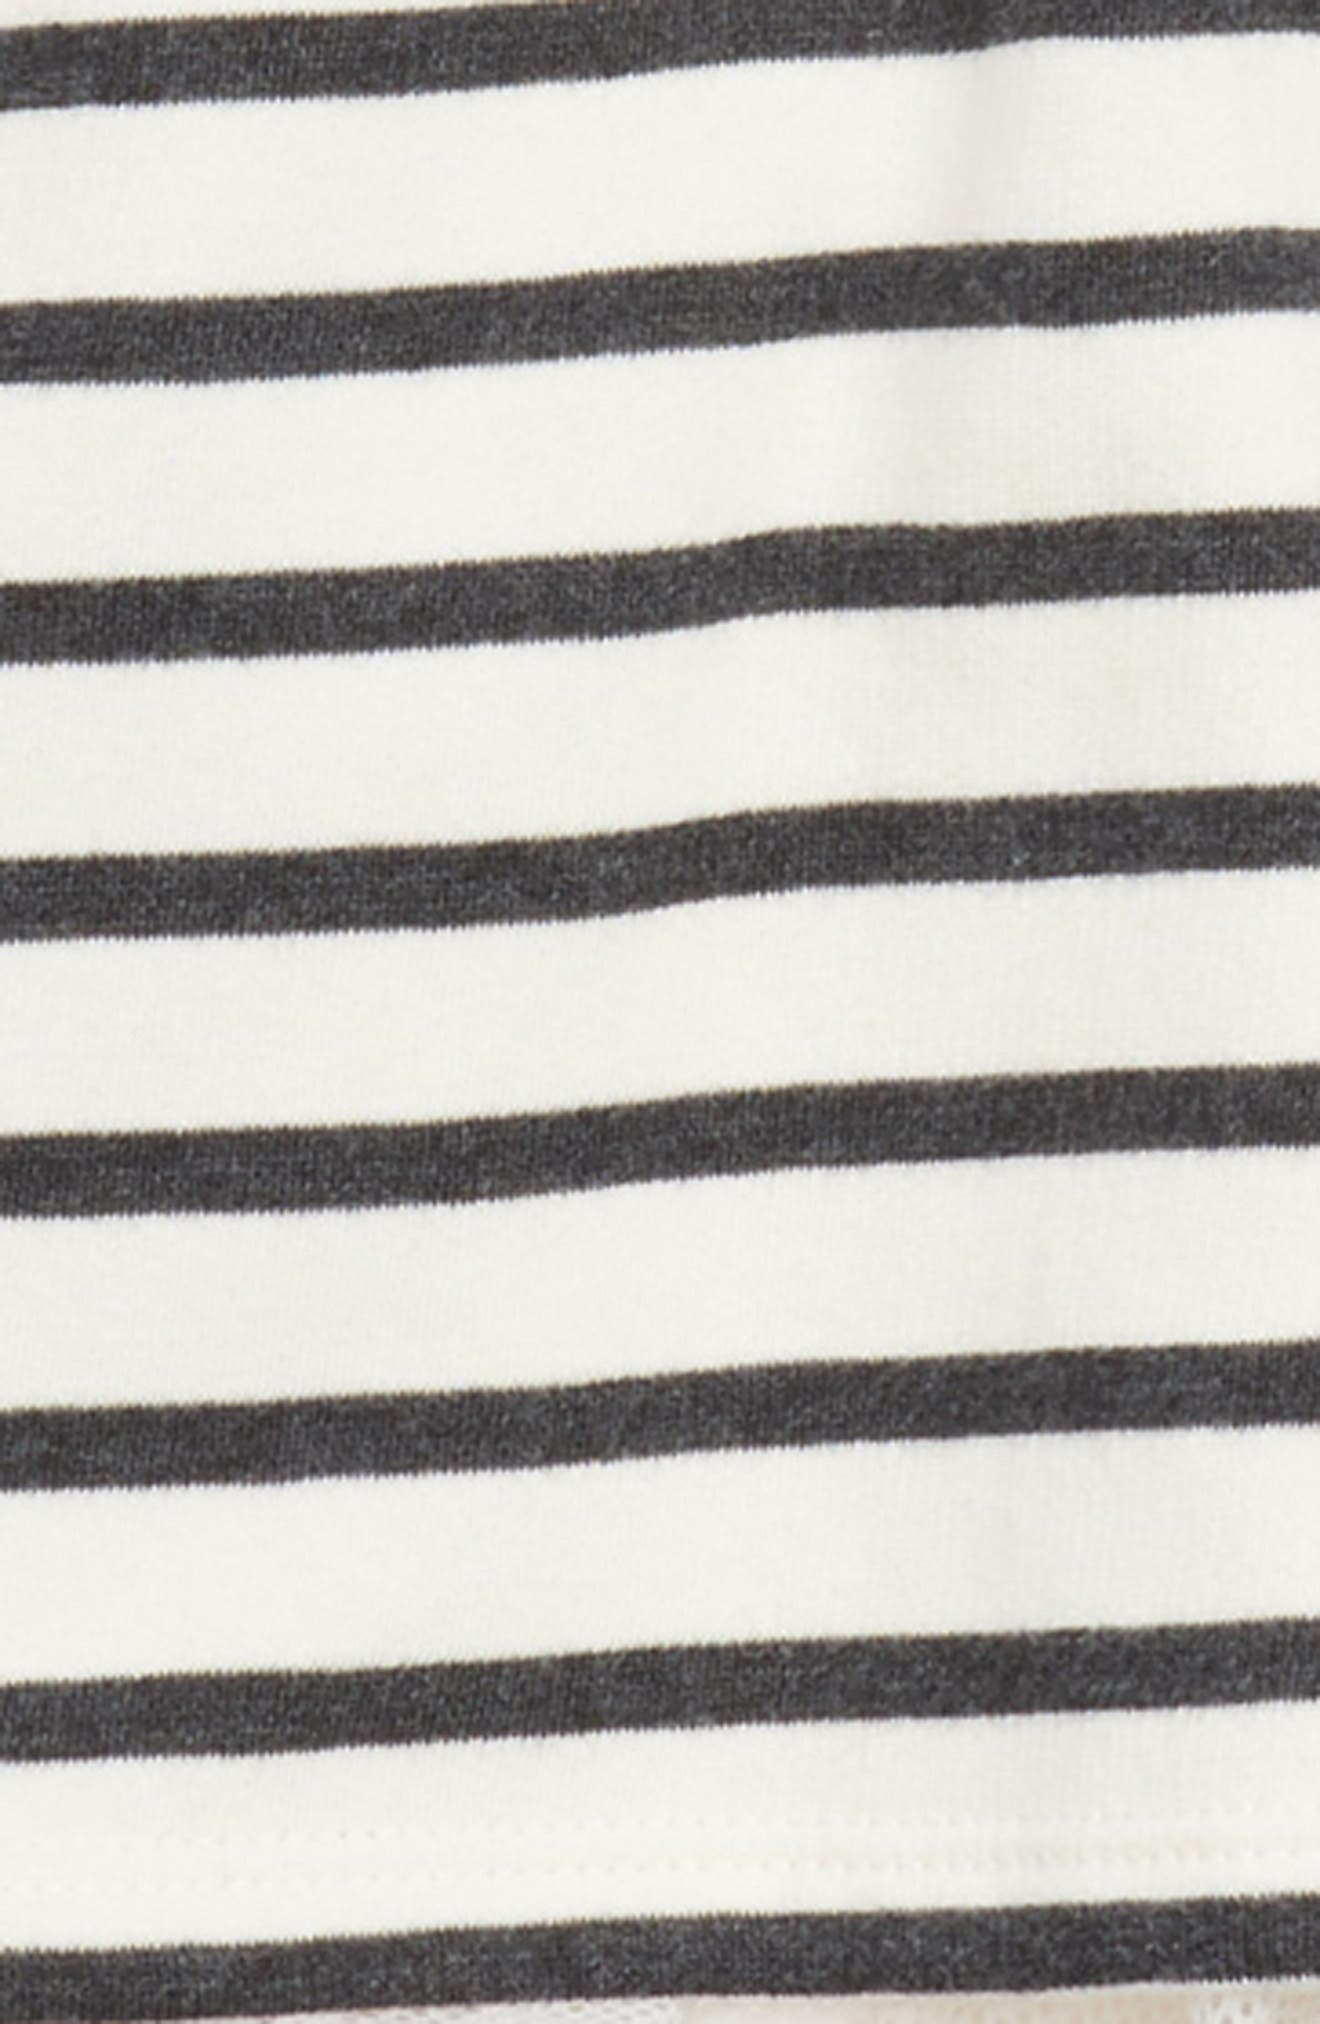 Stripe Crop Hooded Sweatshirt with Back Ruffle,                             Alternate thumbnail 2, color,                             White/ Black